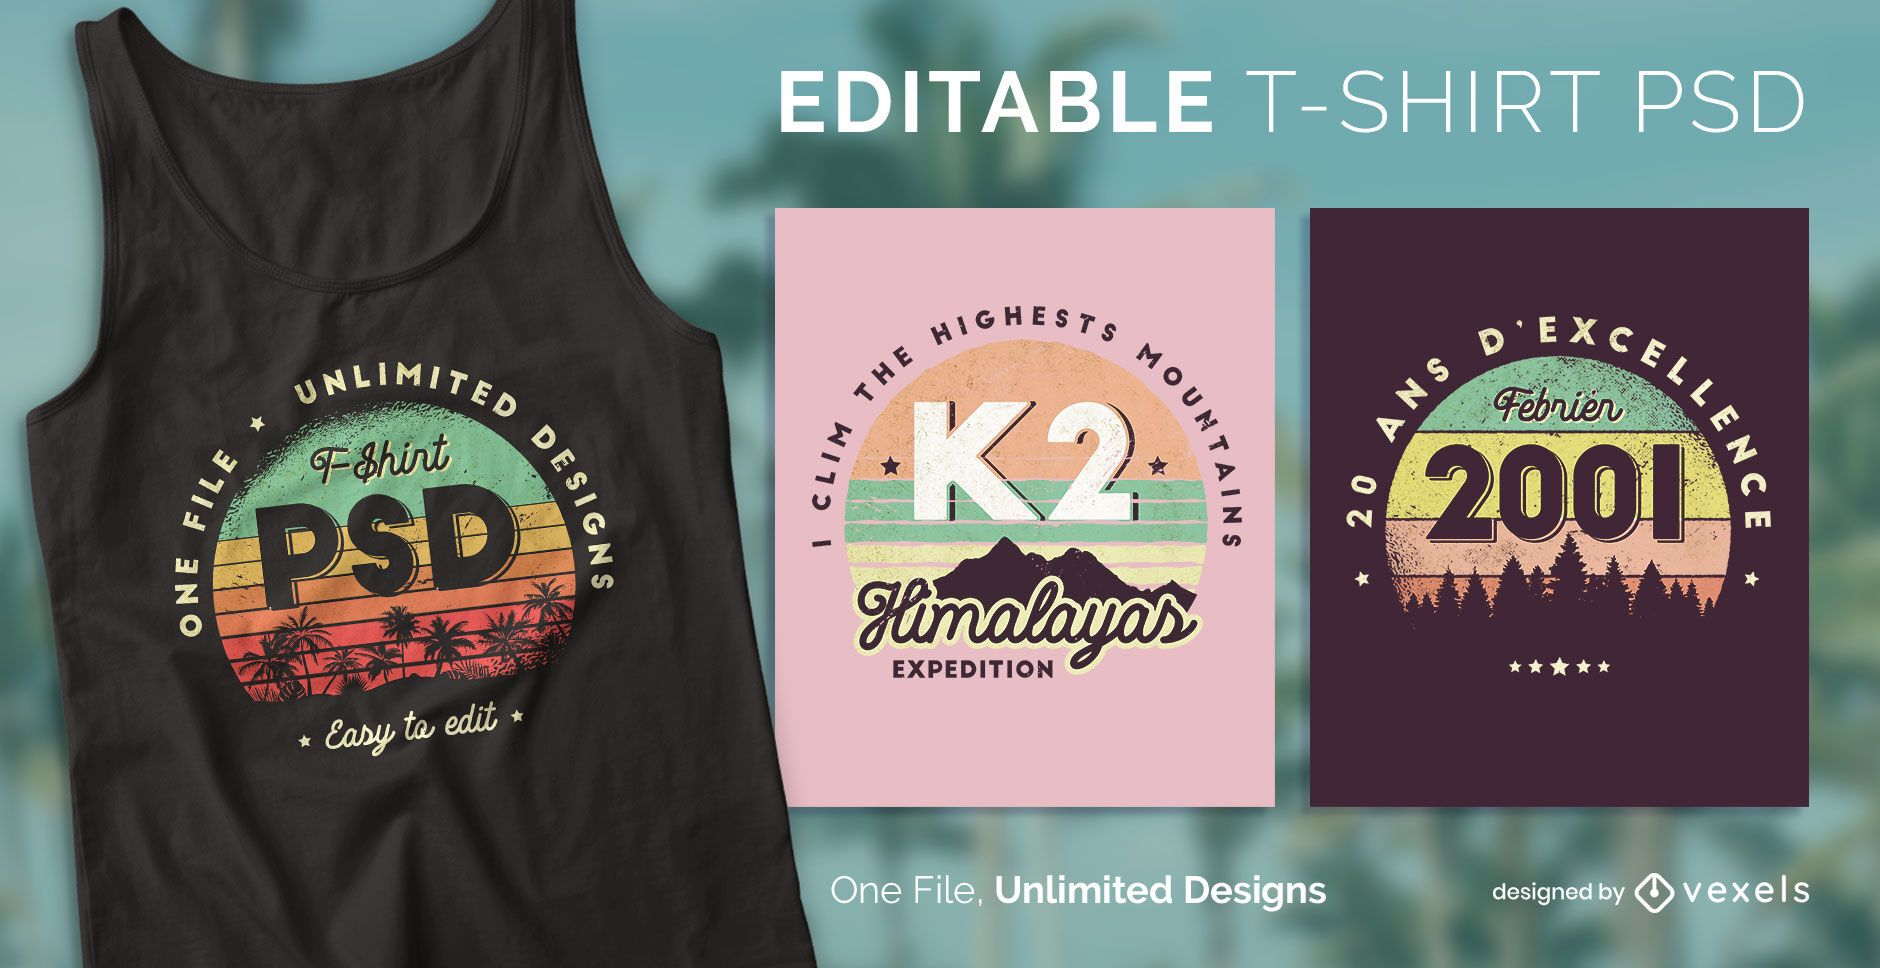 Retro sunset scalable t-shirt psd